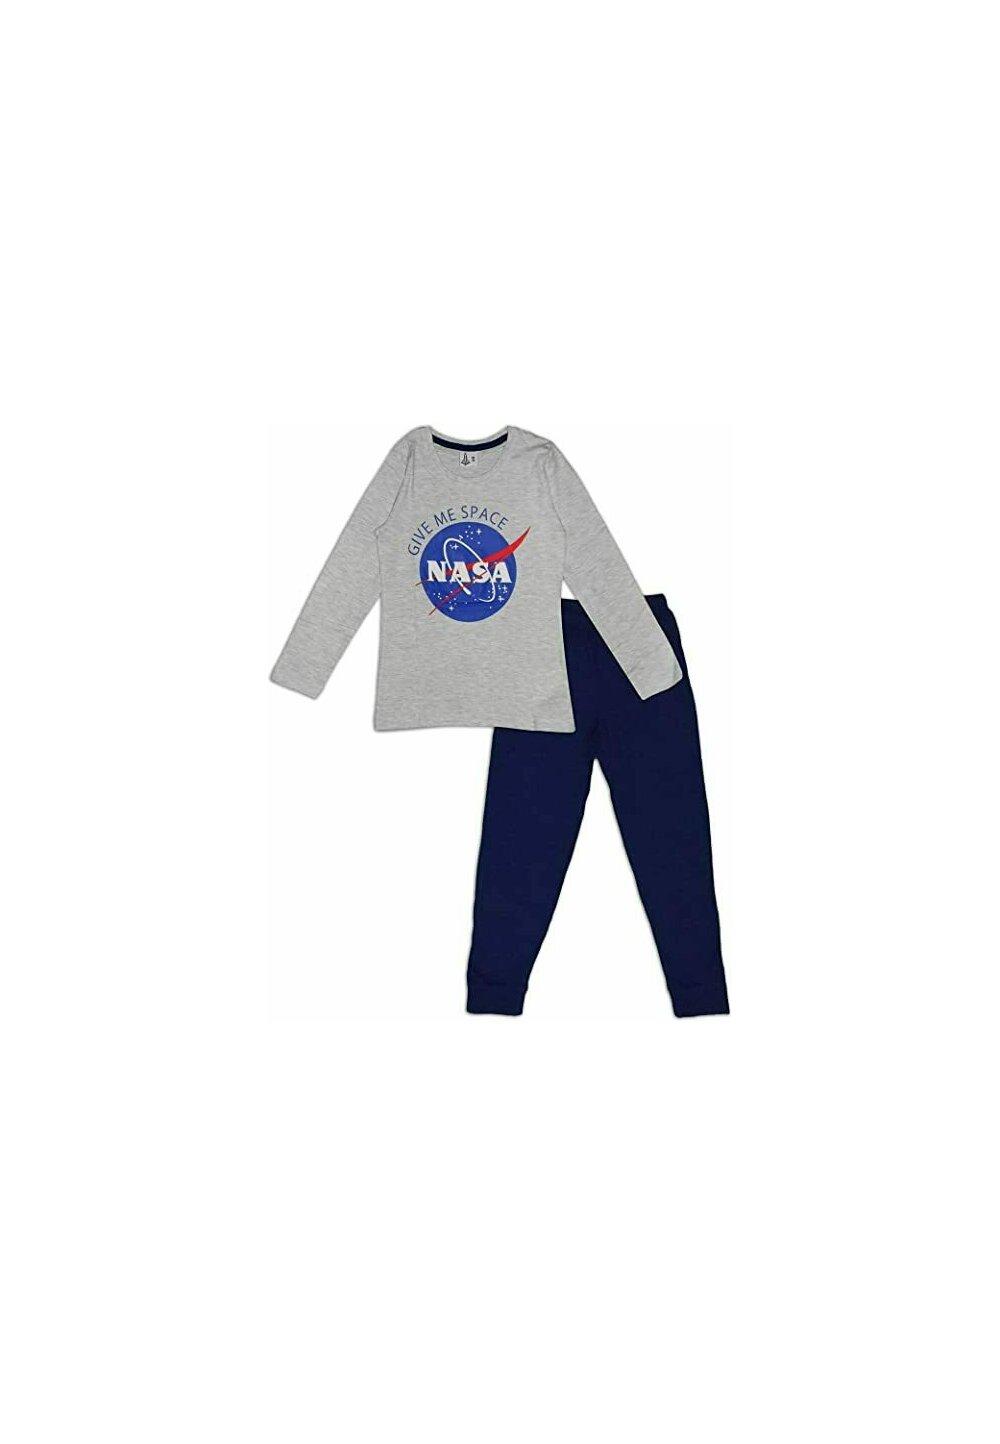 Pijama fete, Nasa Give me space, gri imagine